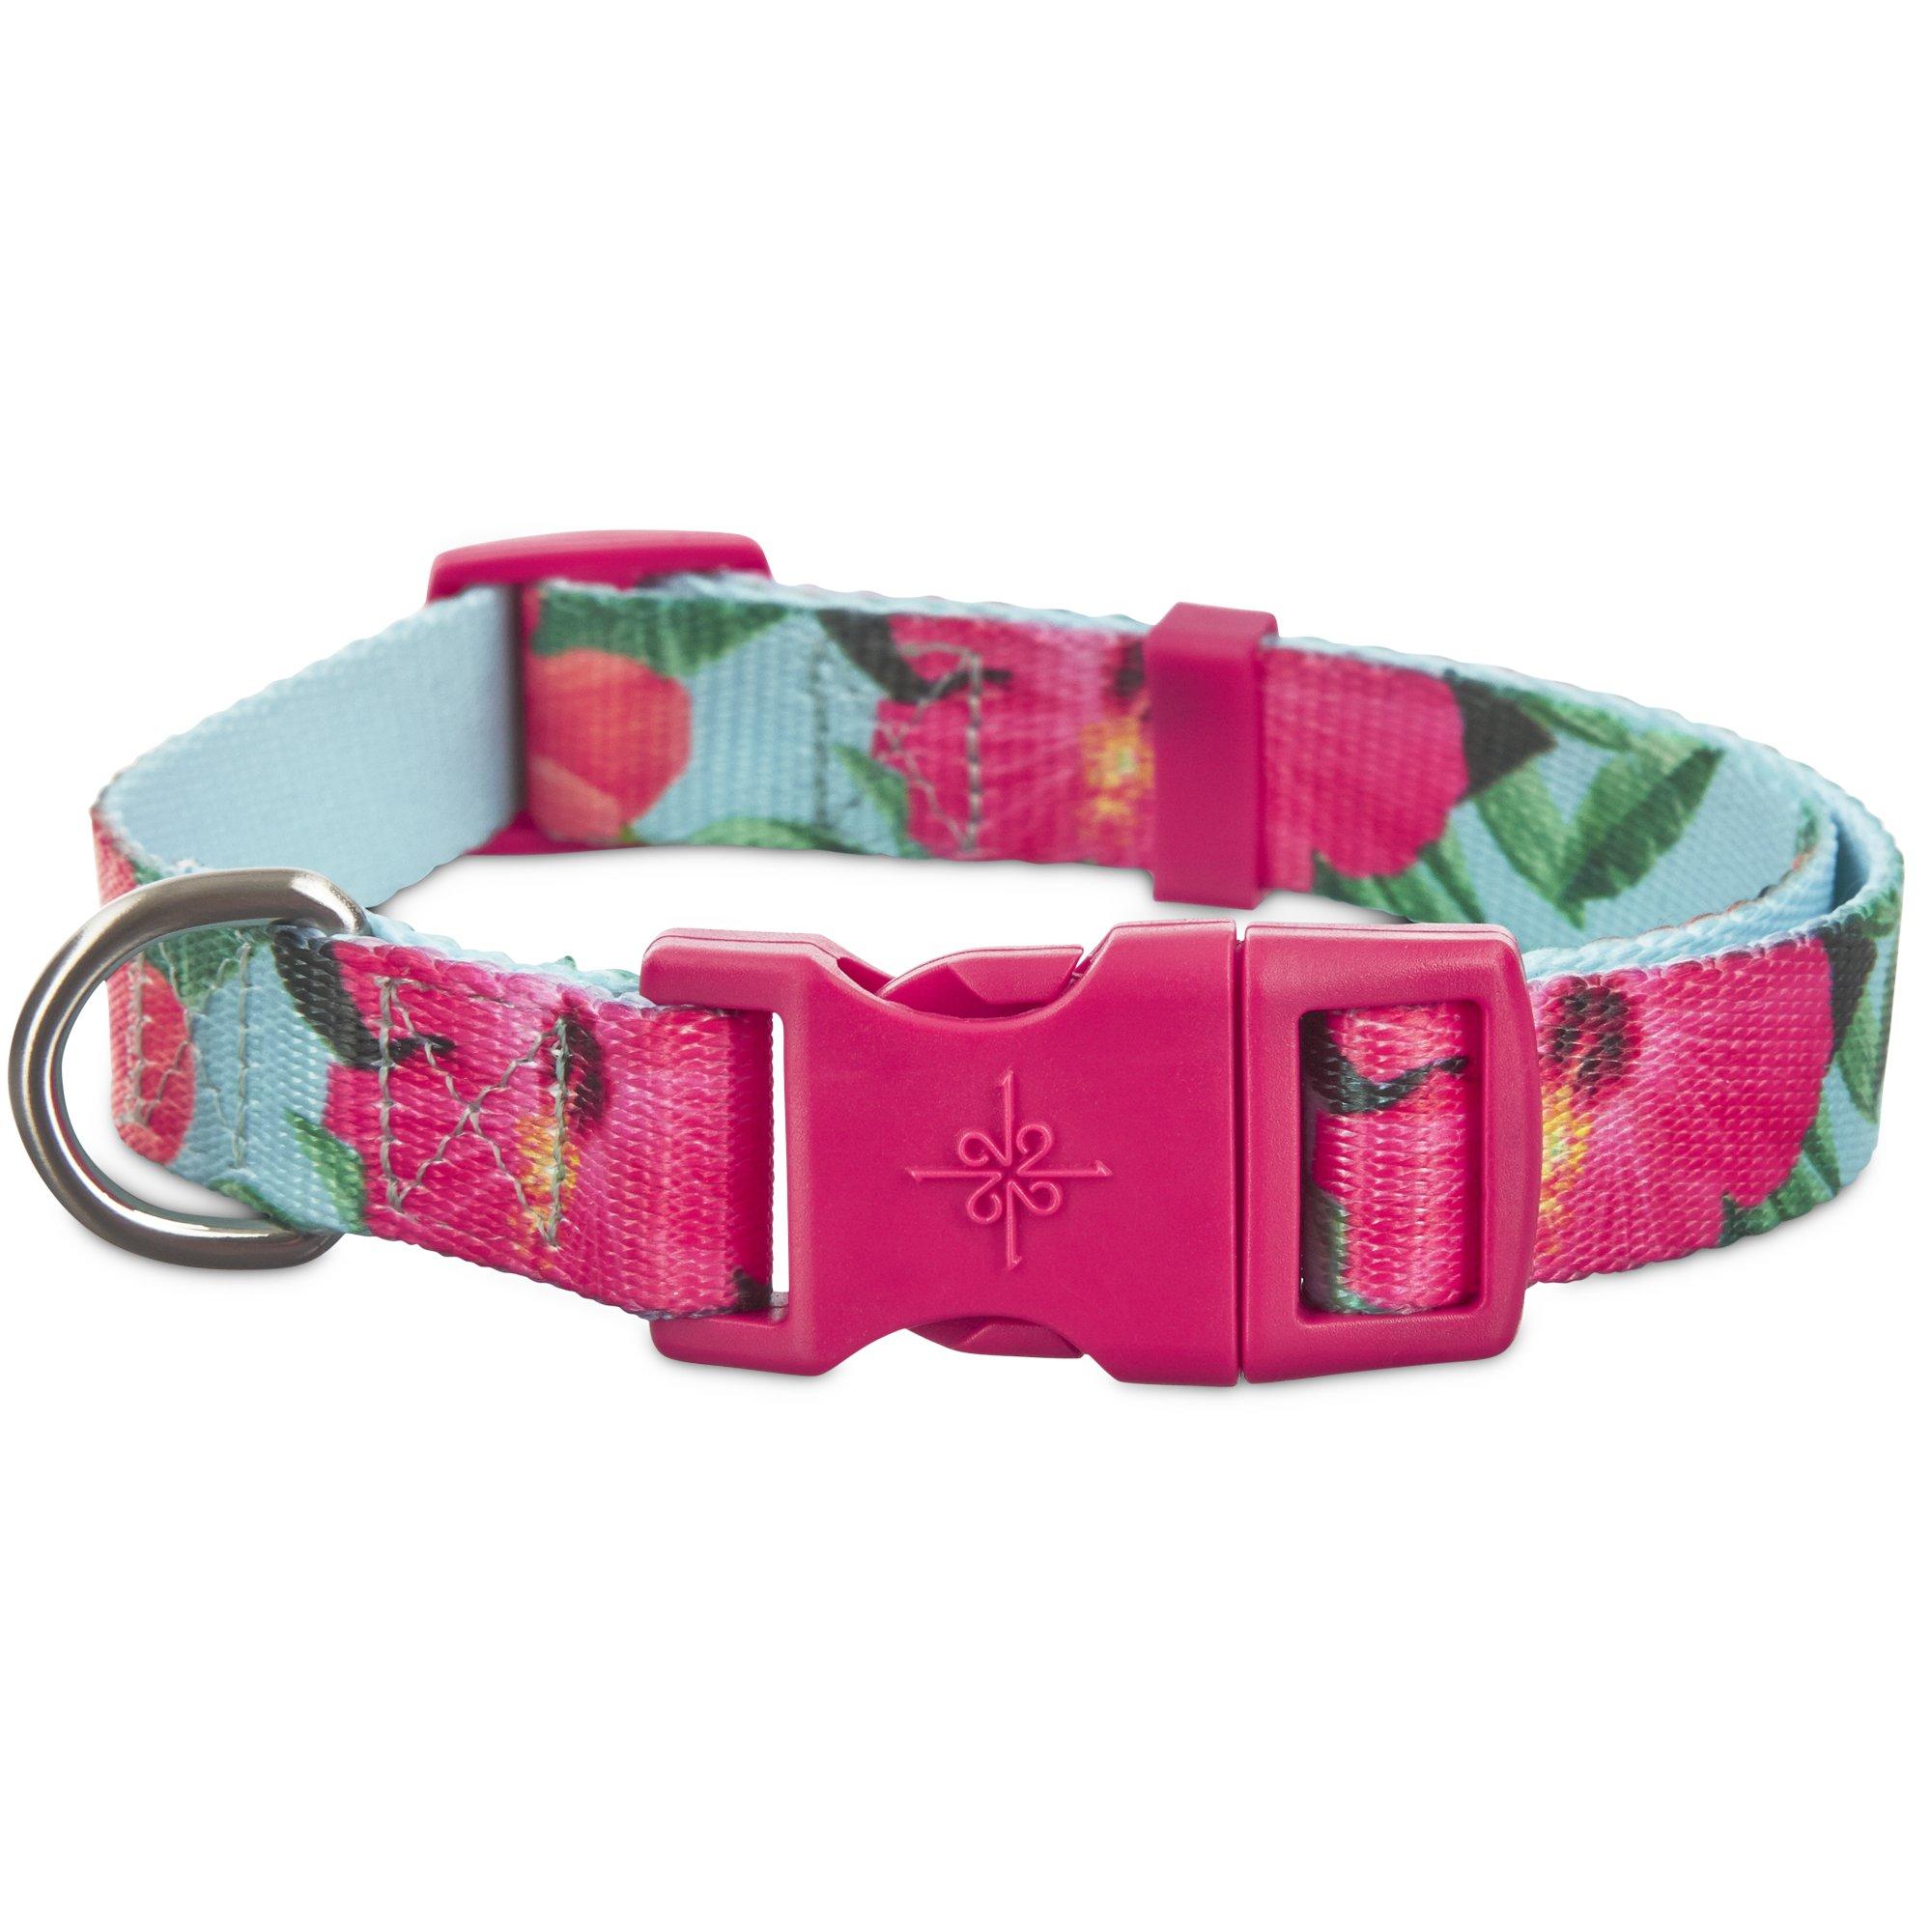 Good2Go Hibiscus Dog Collar | Petco at Petco in Braselton, GA | Tuggl